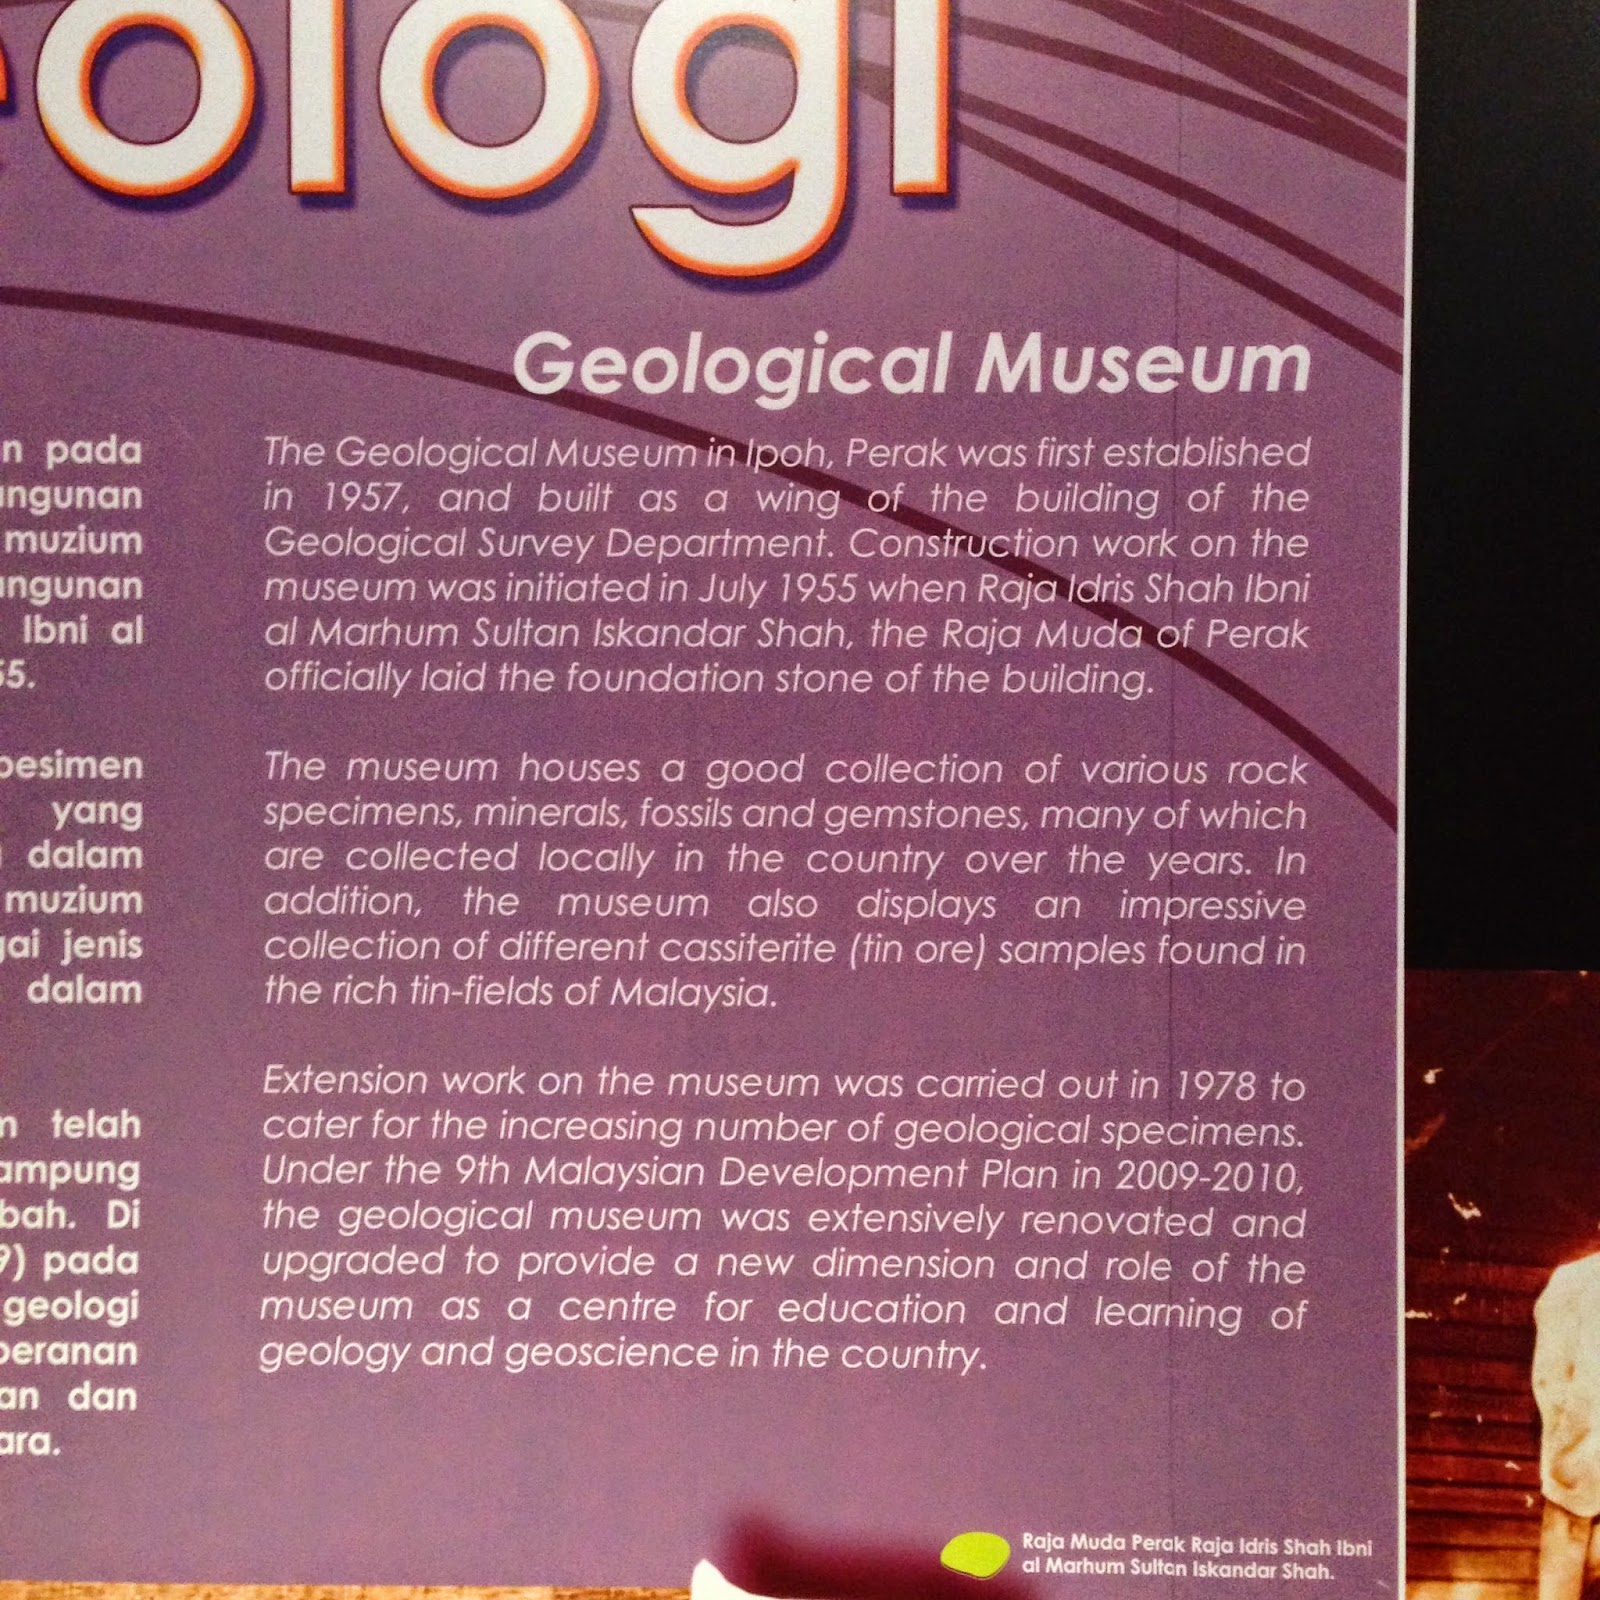 Museum of Geology, Ipoh Perak, Malaysia